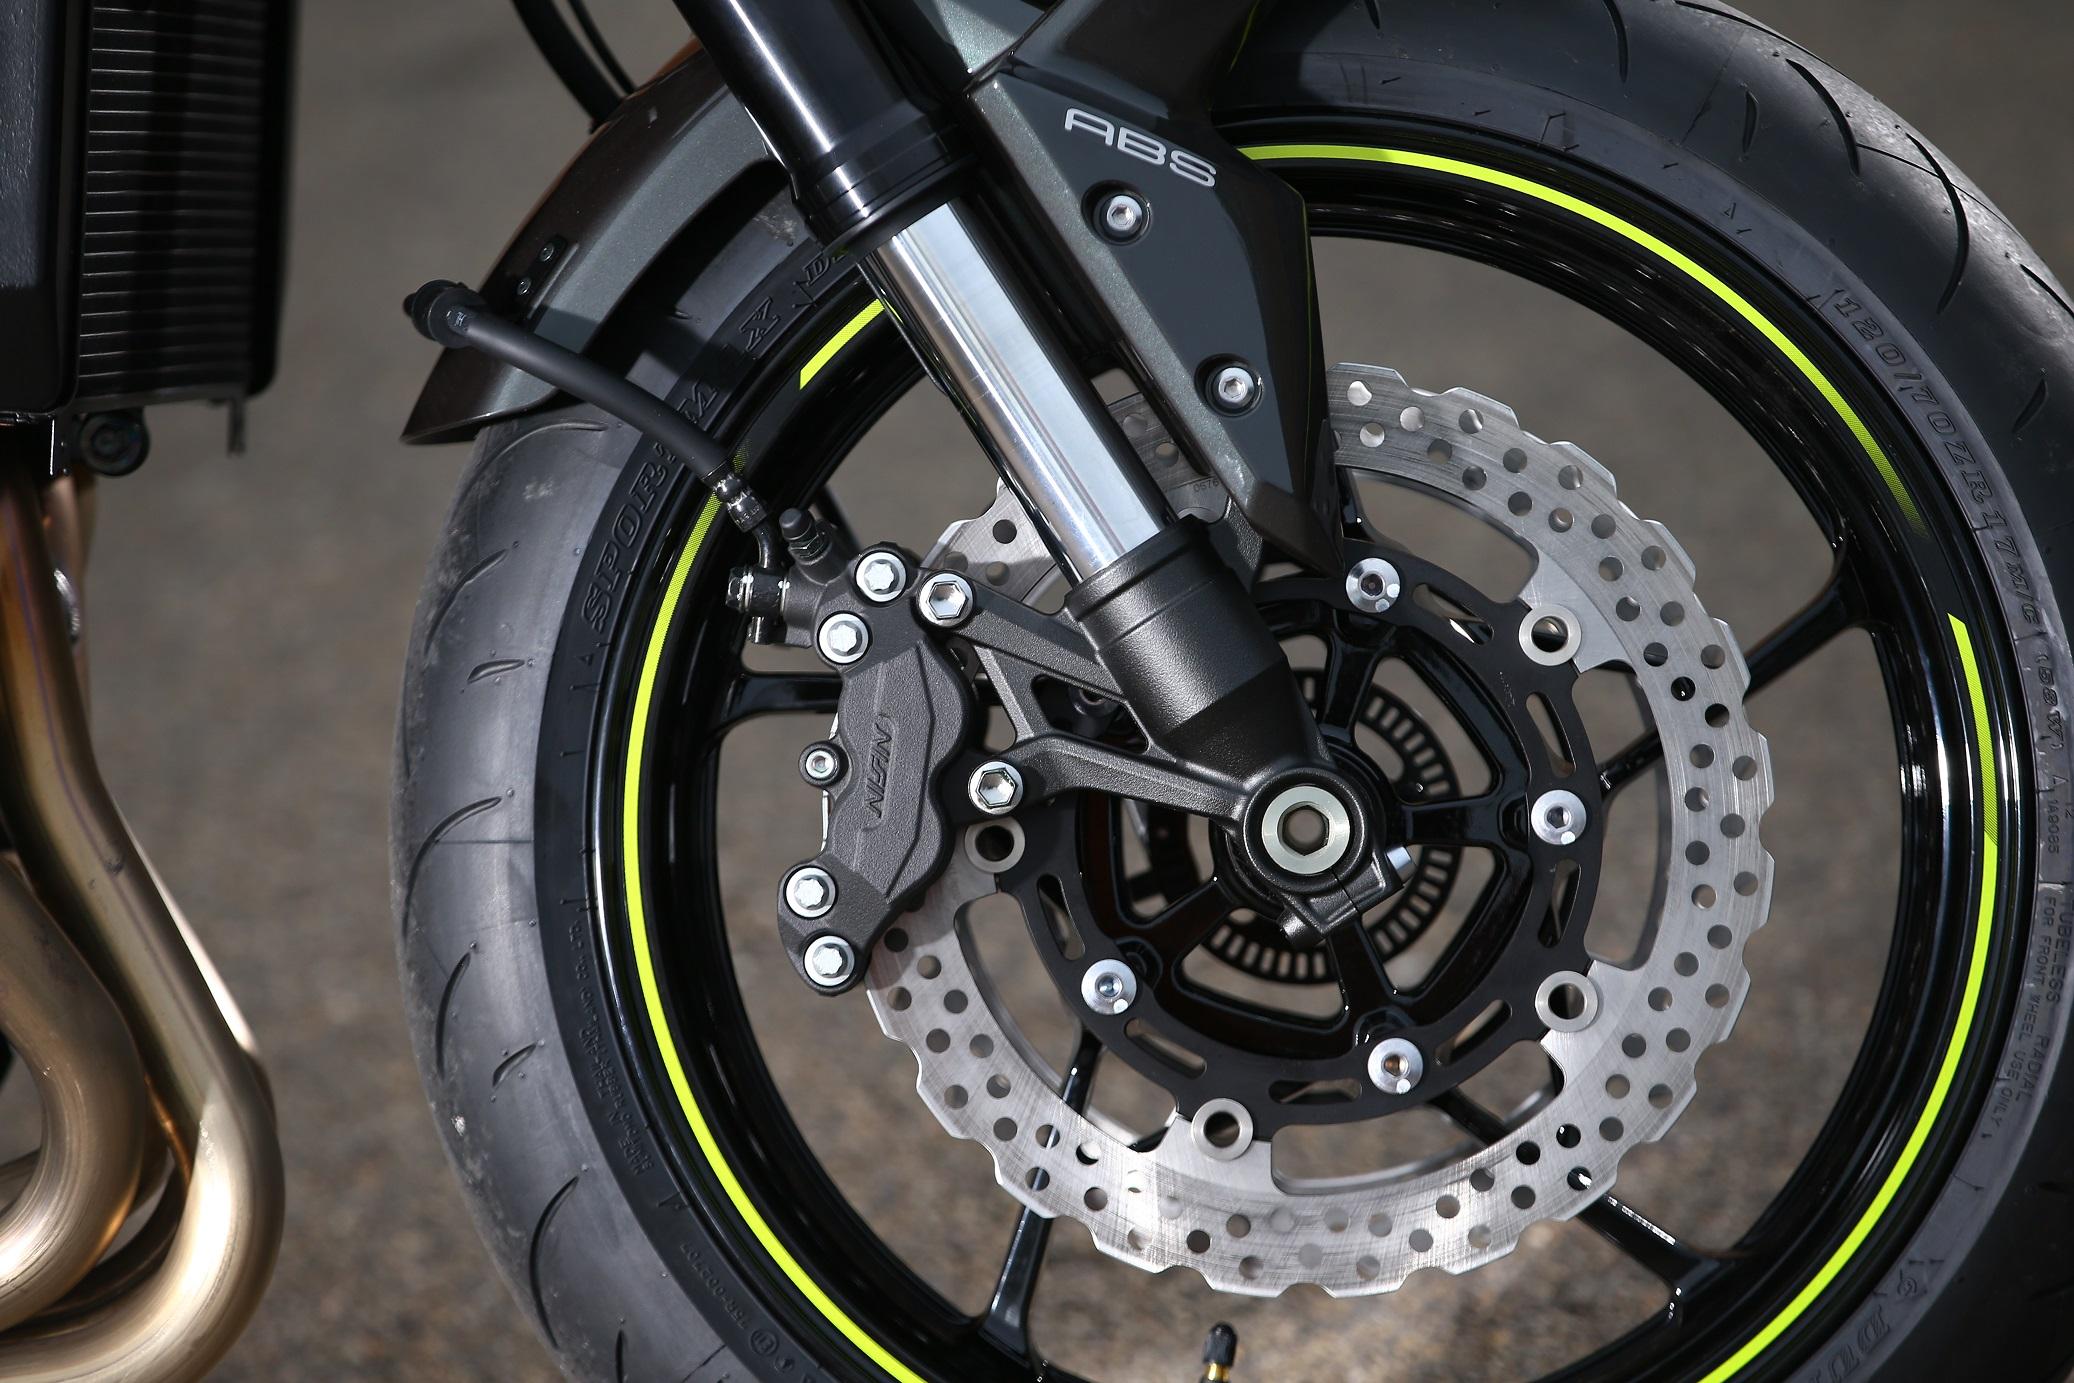 Kawasaki Z900 brakes